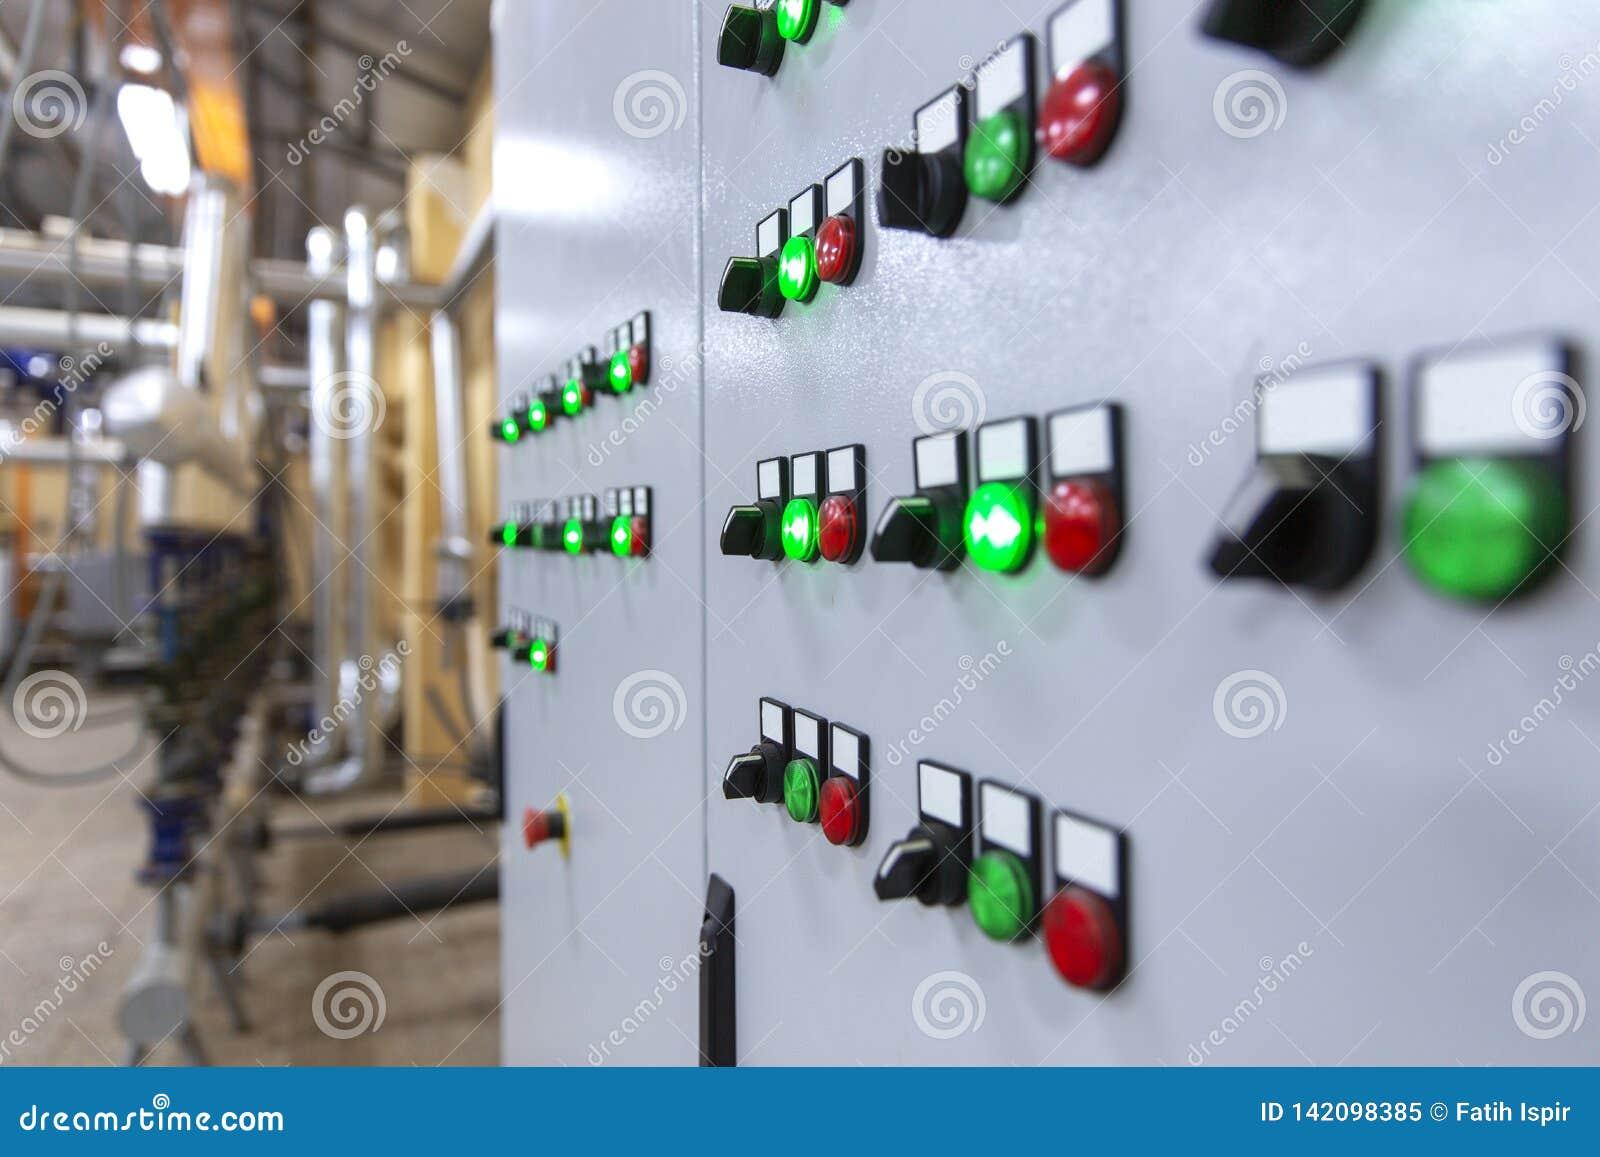 Industrieel controlebord